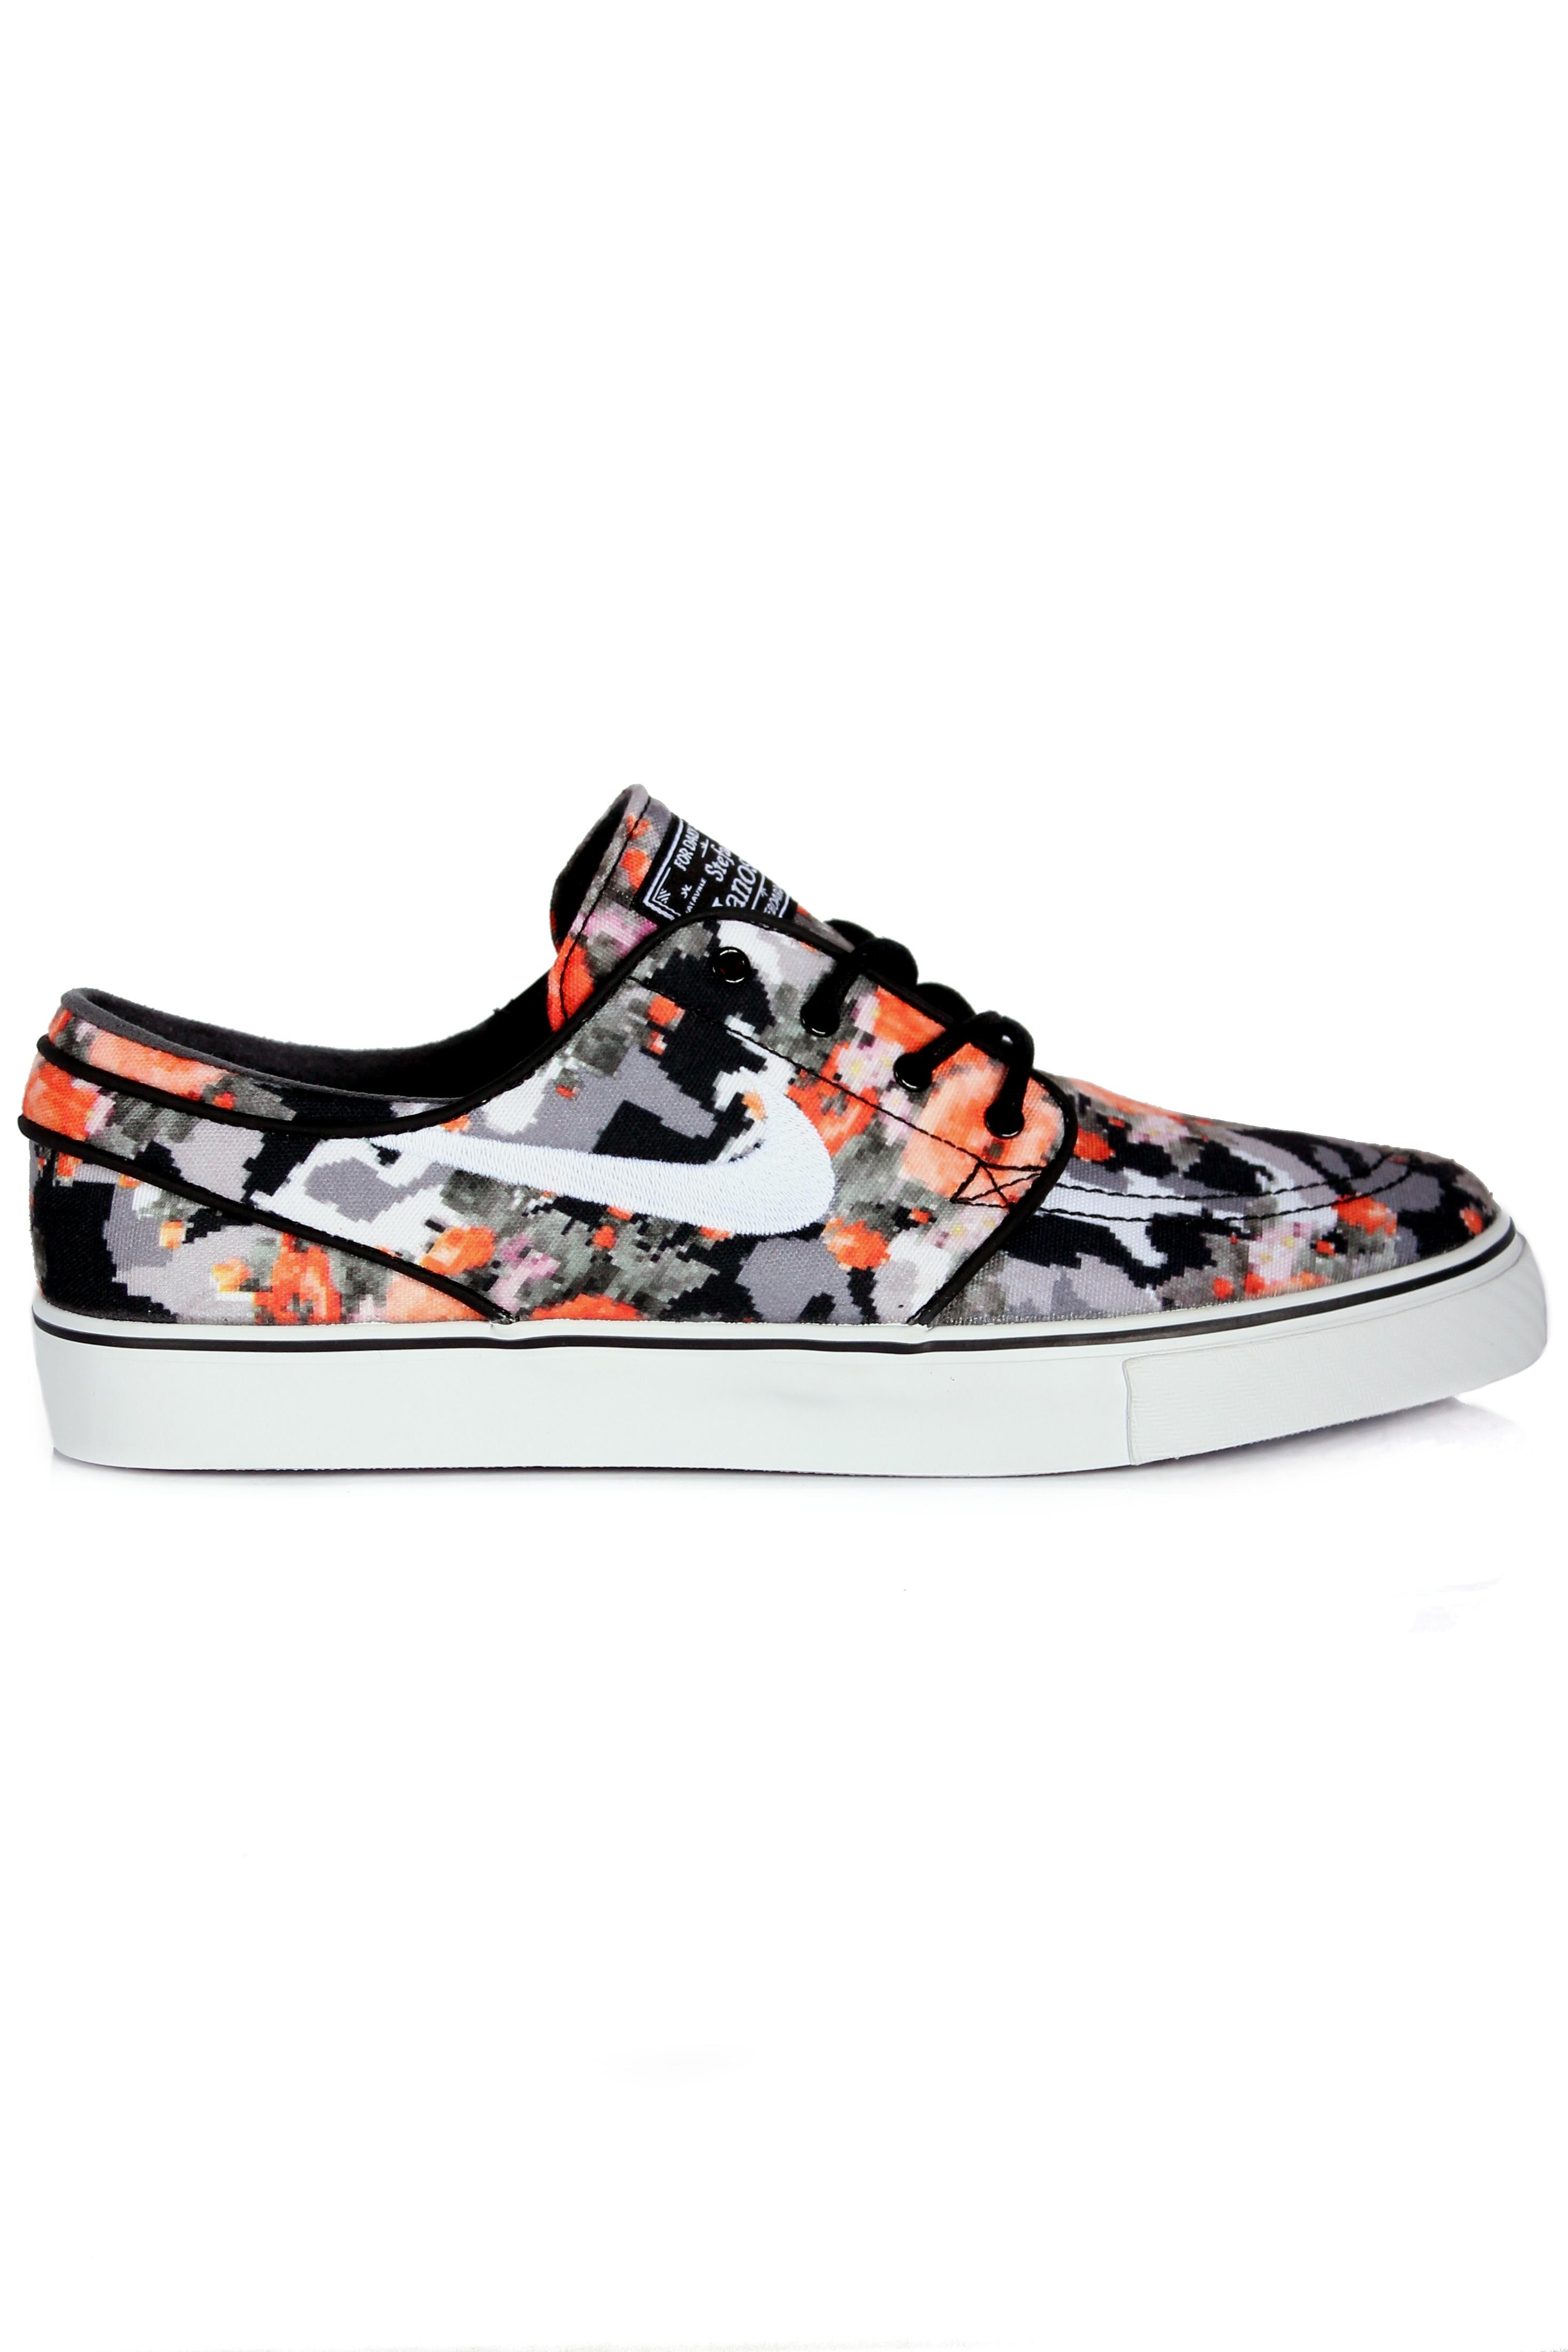 Buty Nike Sb Stefan Janoski Pr (Floral Digi Camo Mandarin)